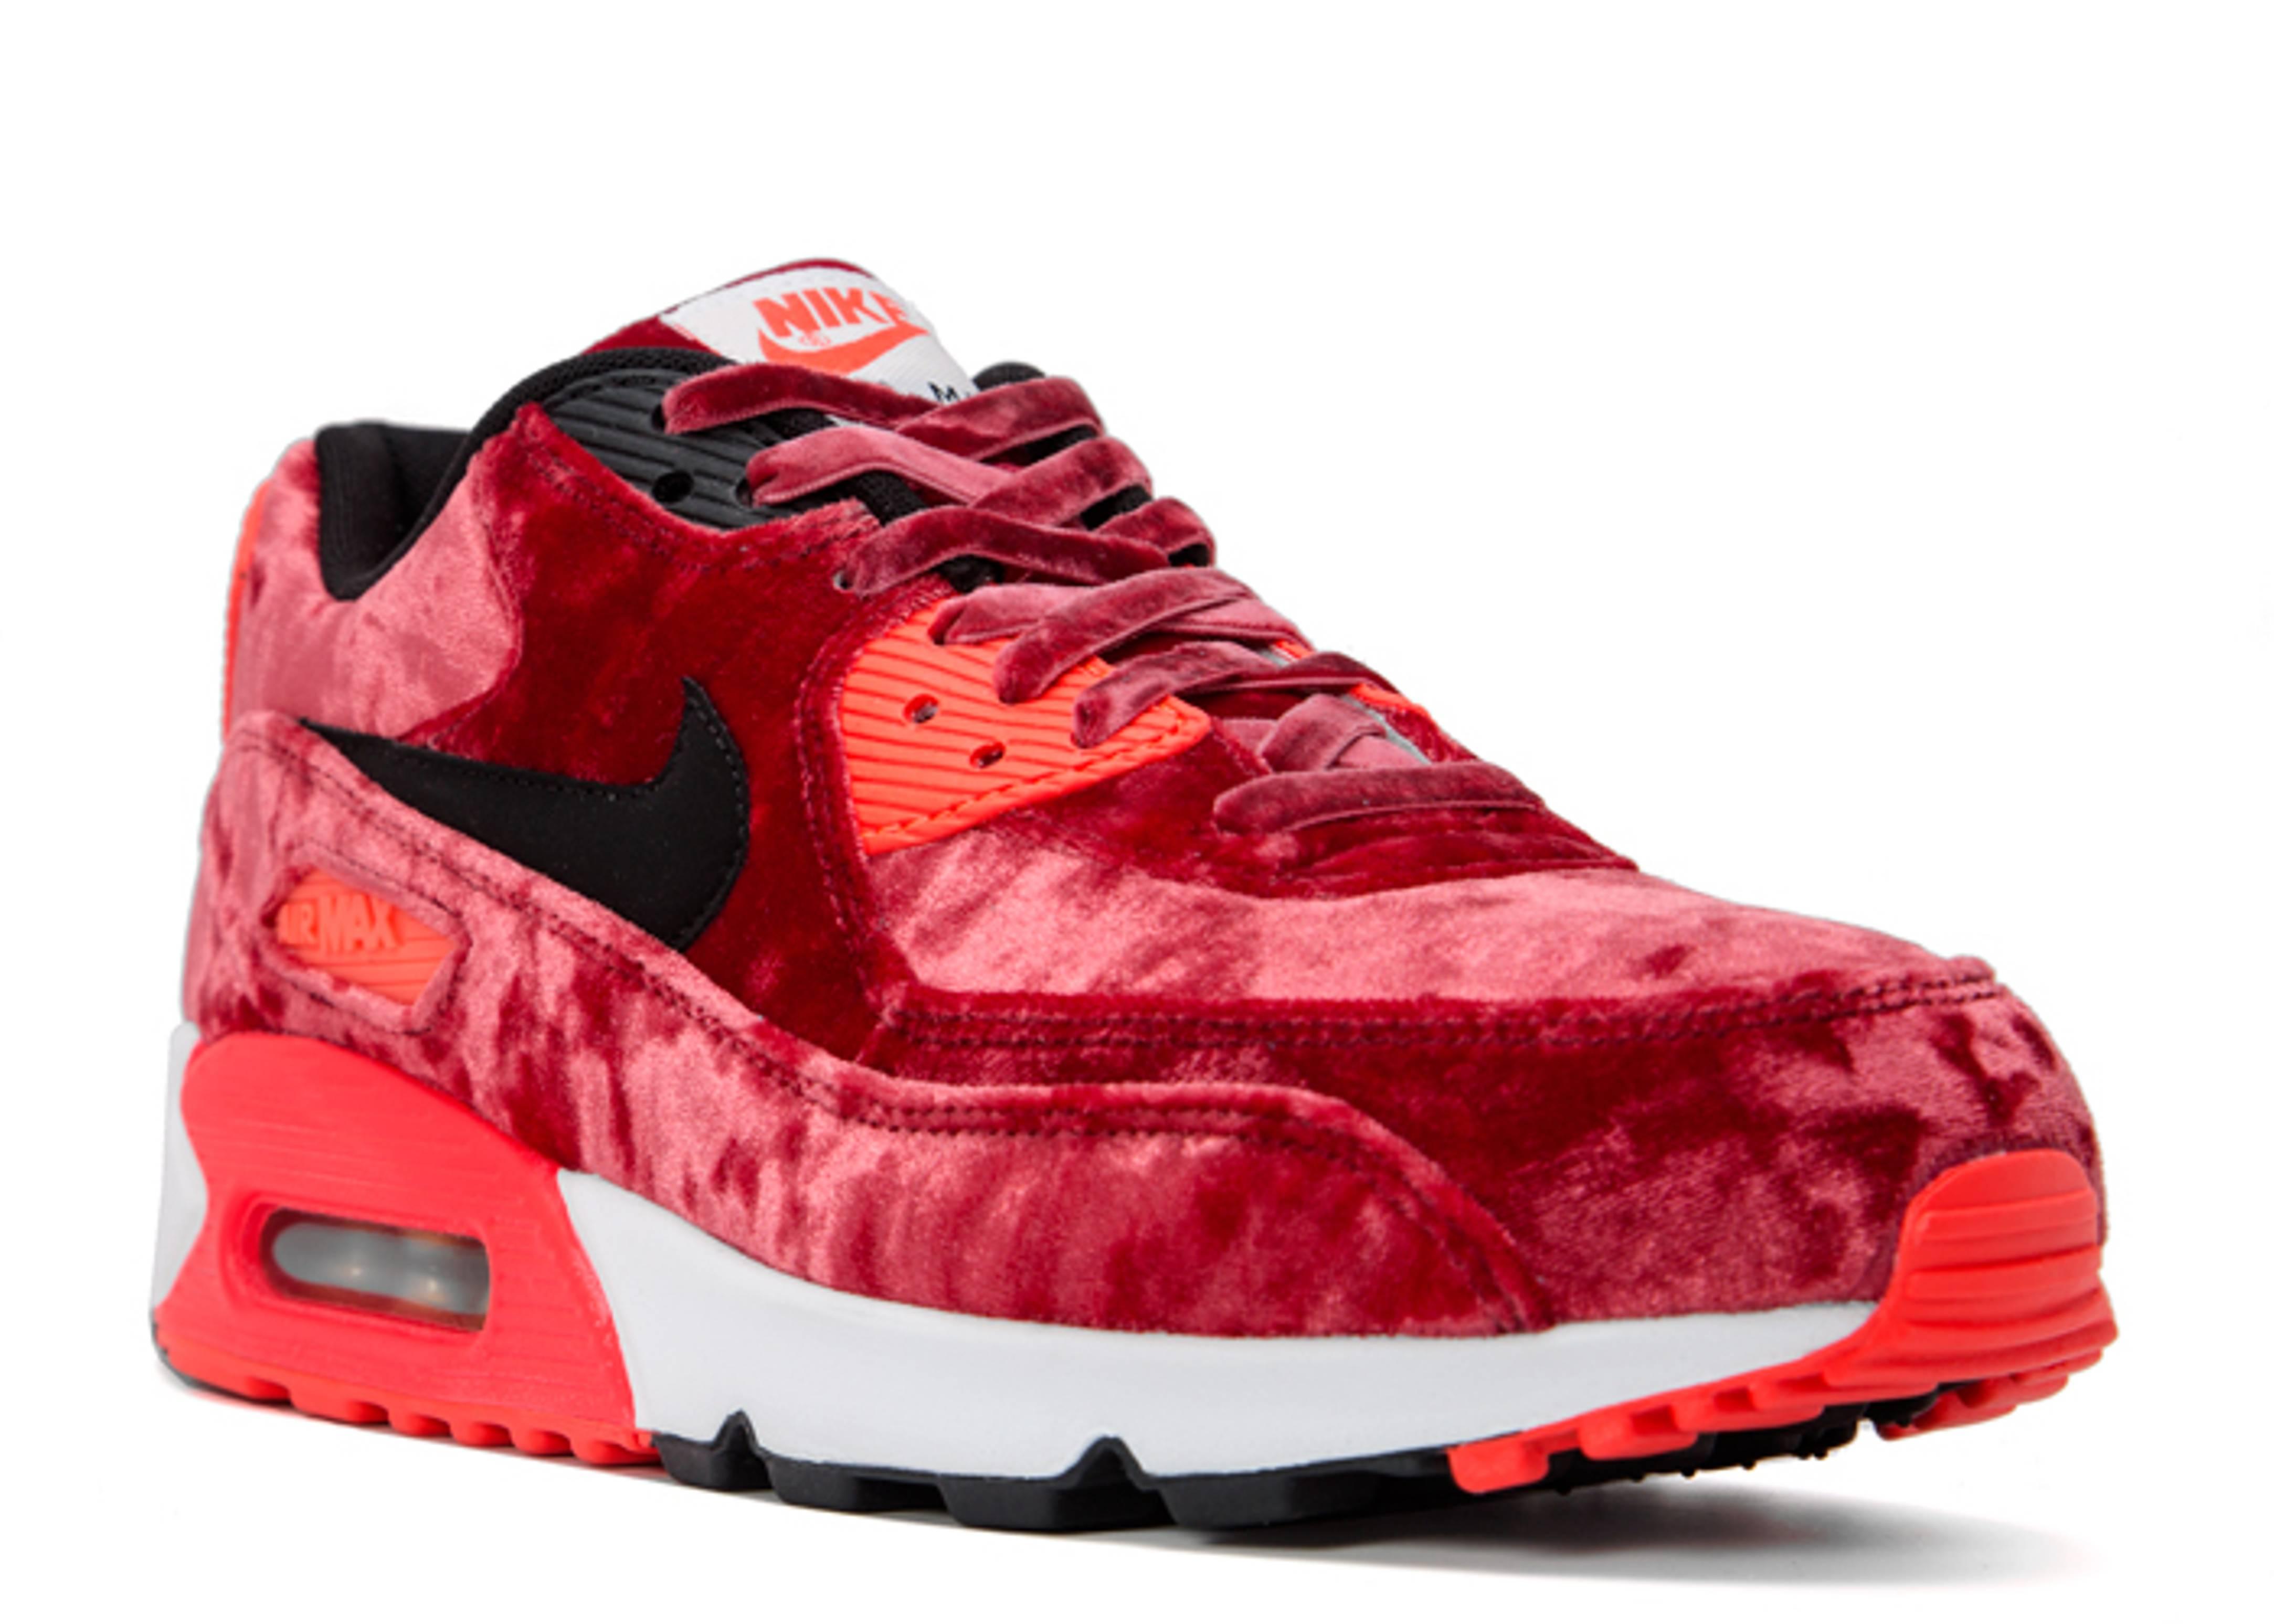 90S Air Max Red